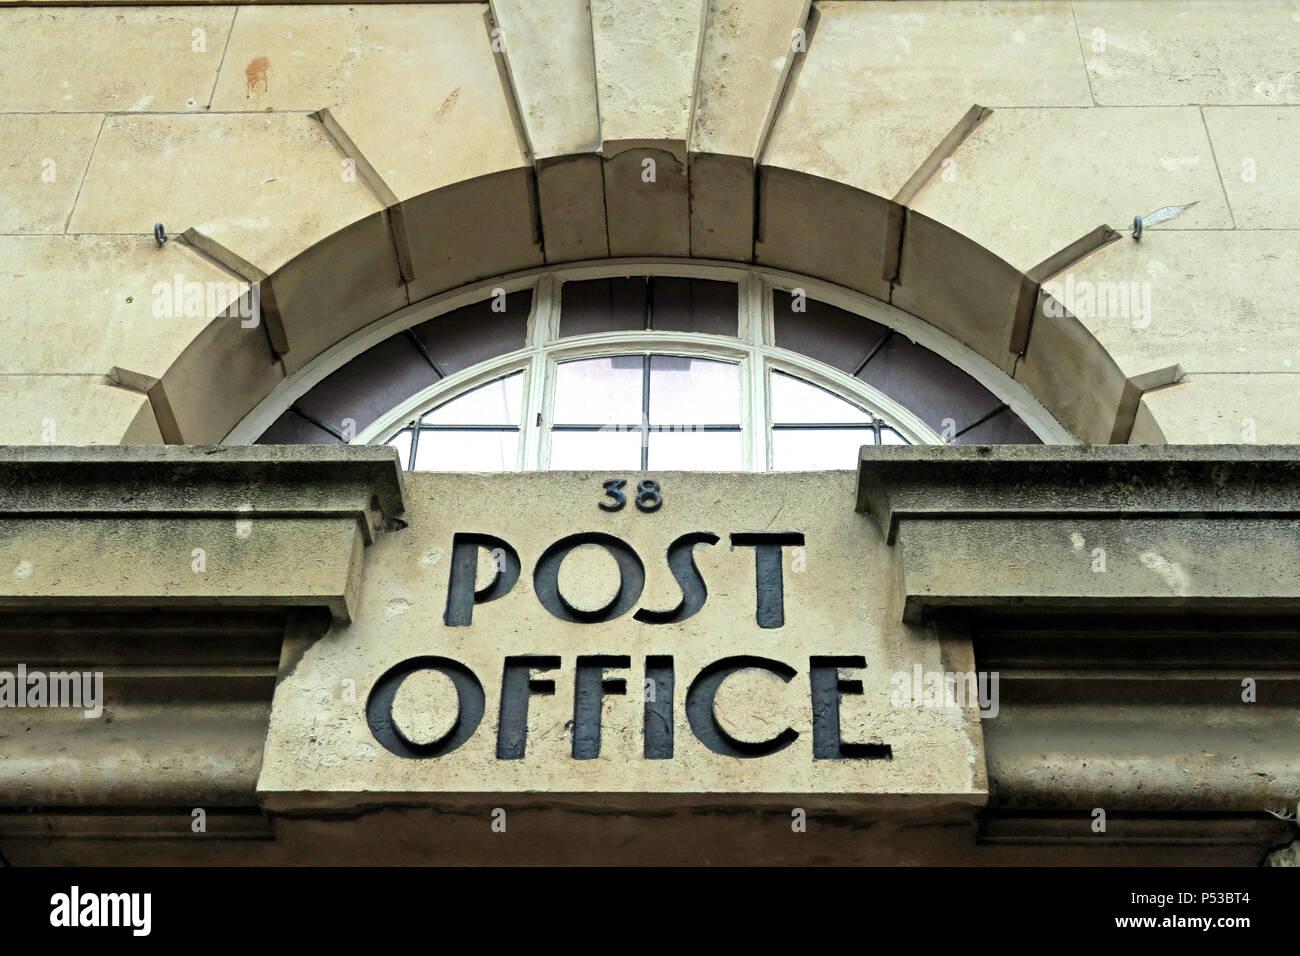 GoTonySmith,@HotpixUK,TA1,38 Post Office Building - Ask Italian - Former Post,38 North St,Somerset,England,UK,38 Post Office,Building,38,Ask,Italian,art deco design,Georgian Art Deco